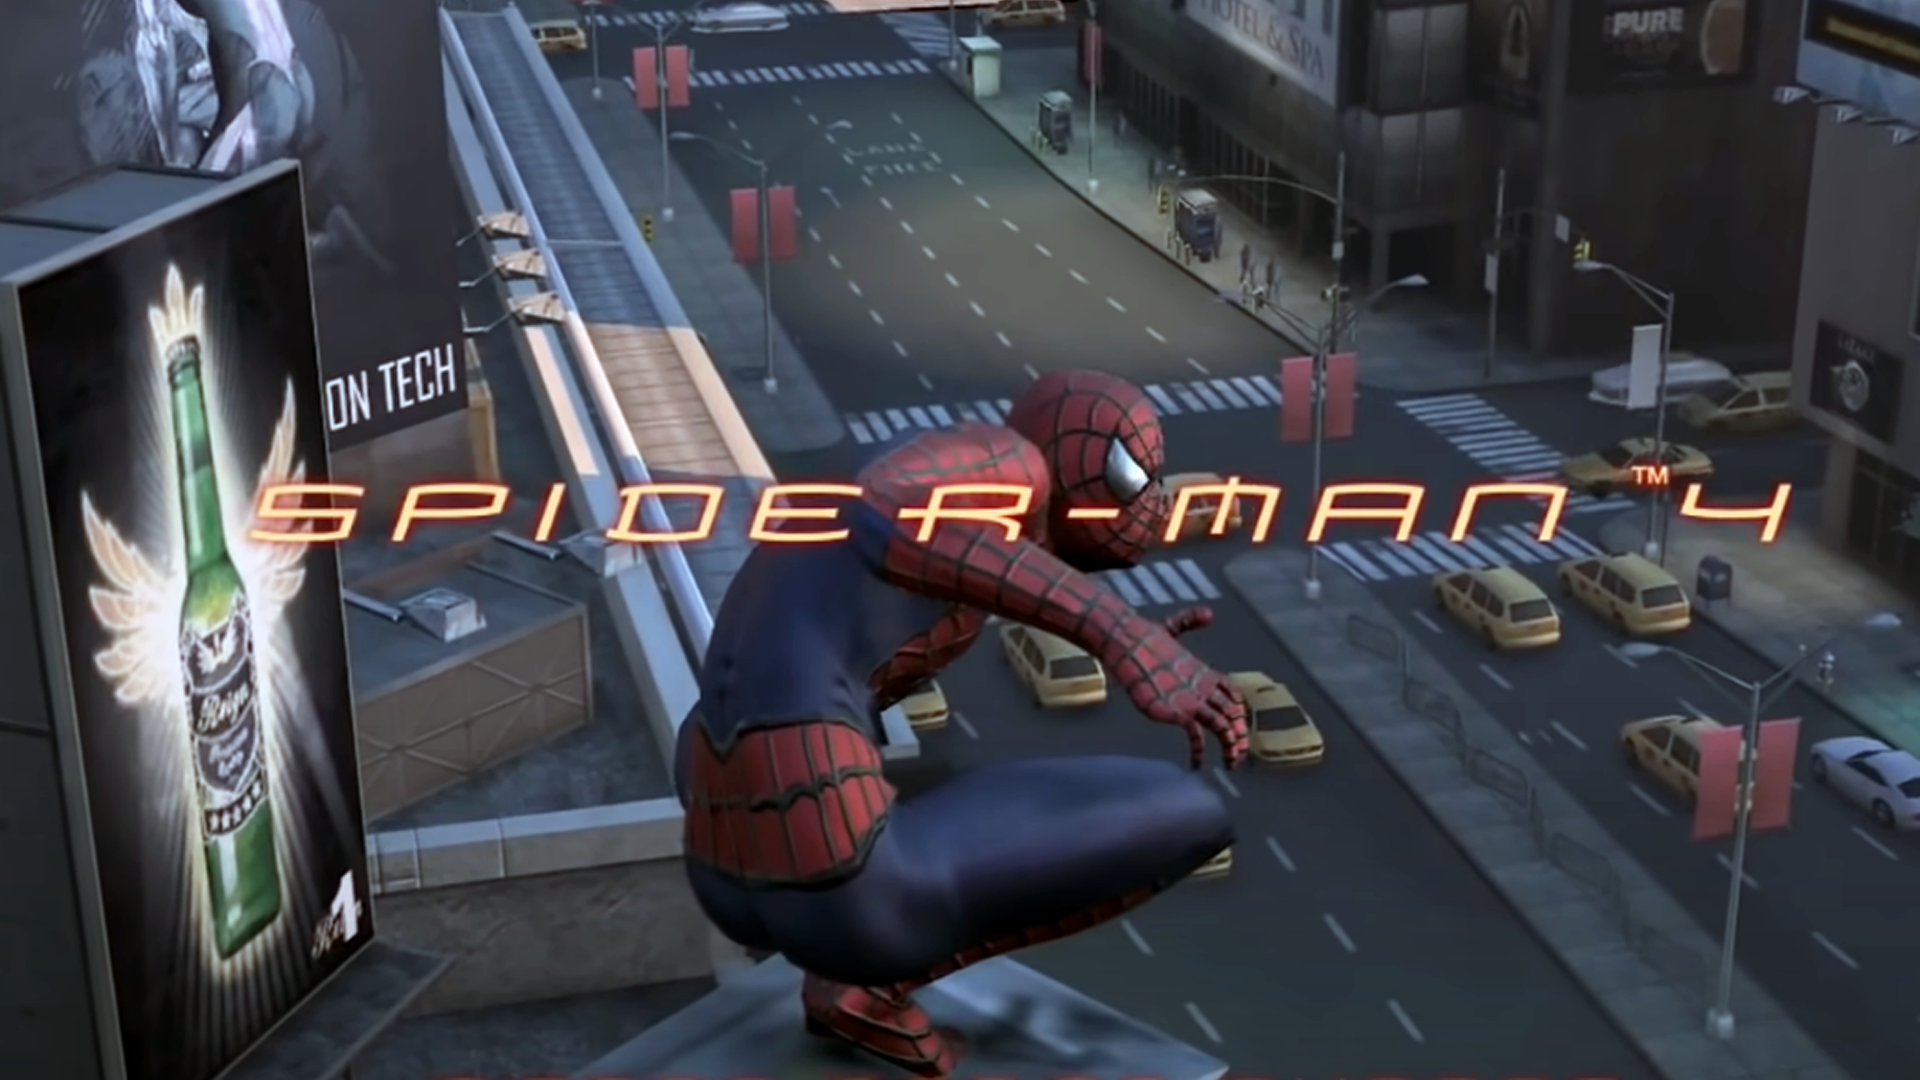 Here's the Spider-Man 4 game we should've got alongside a movie